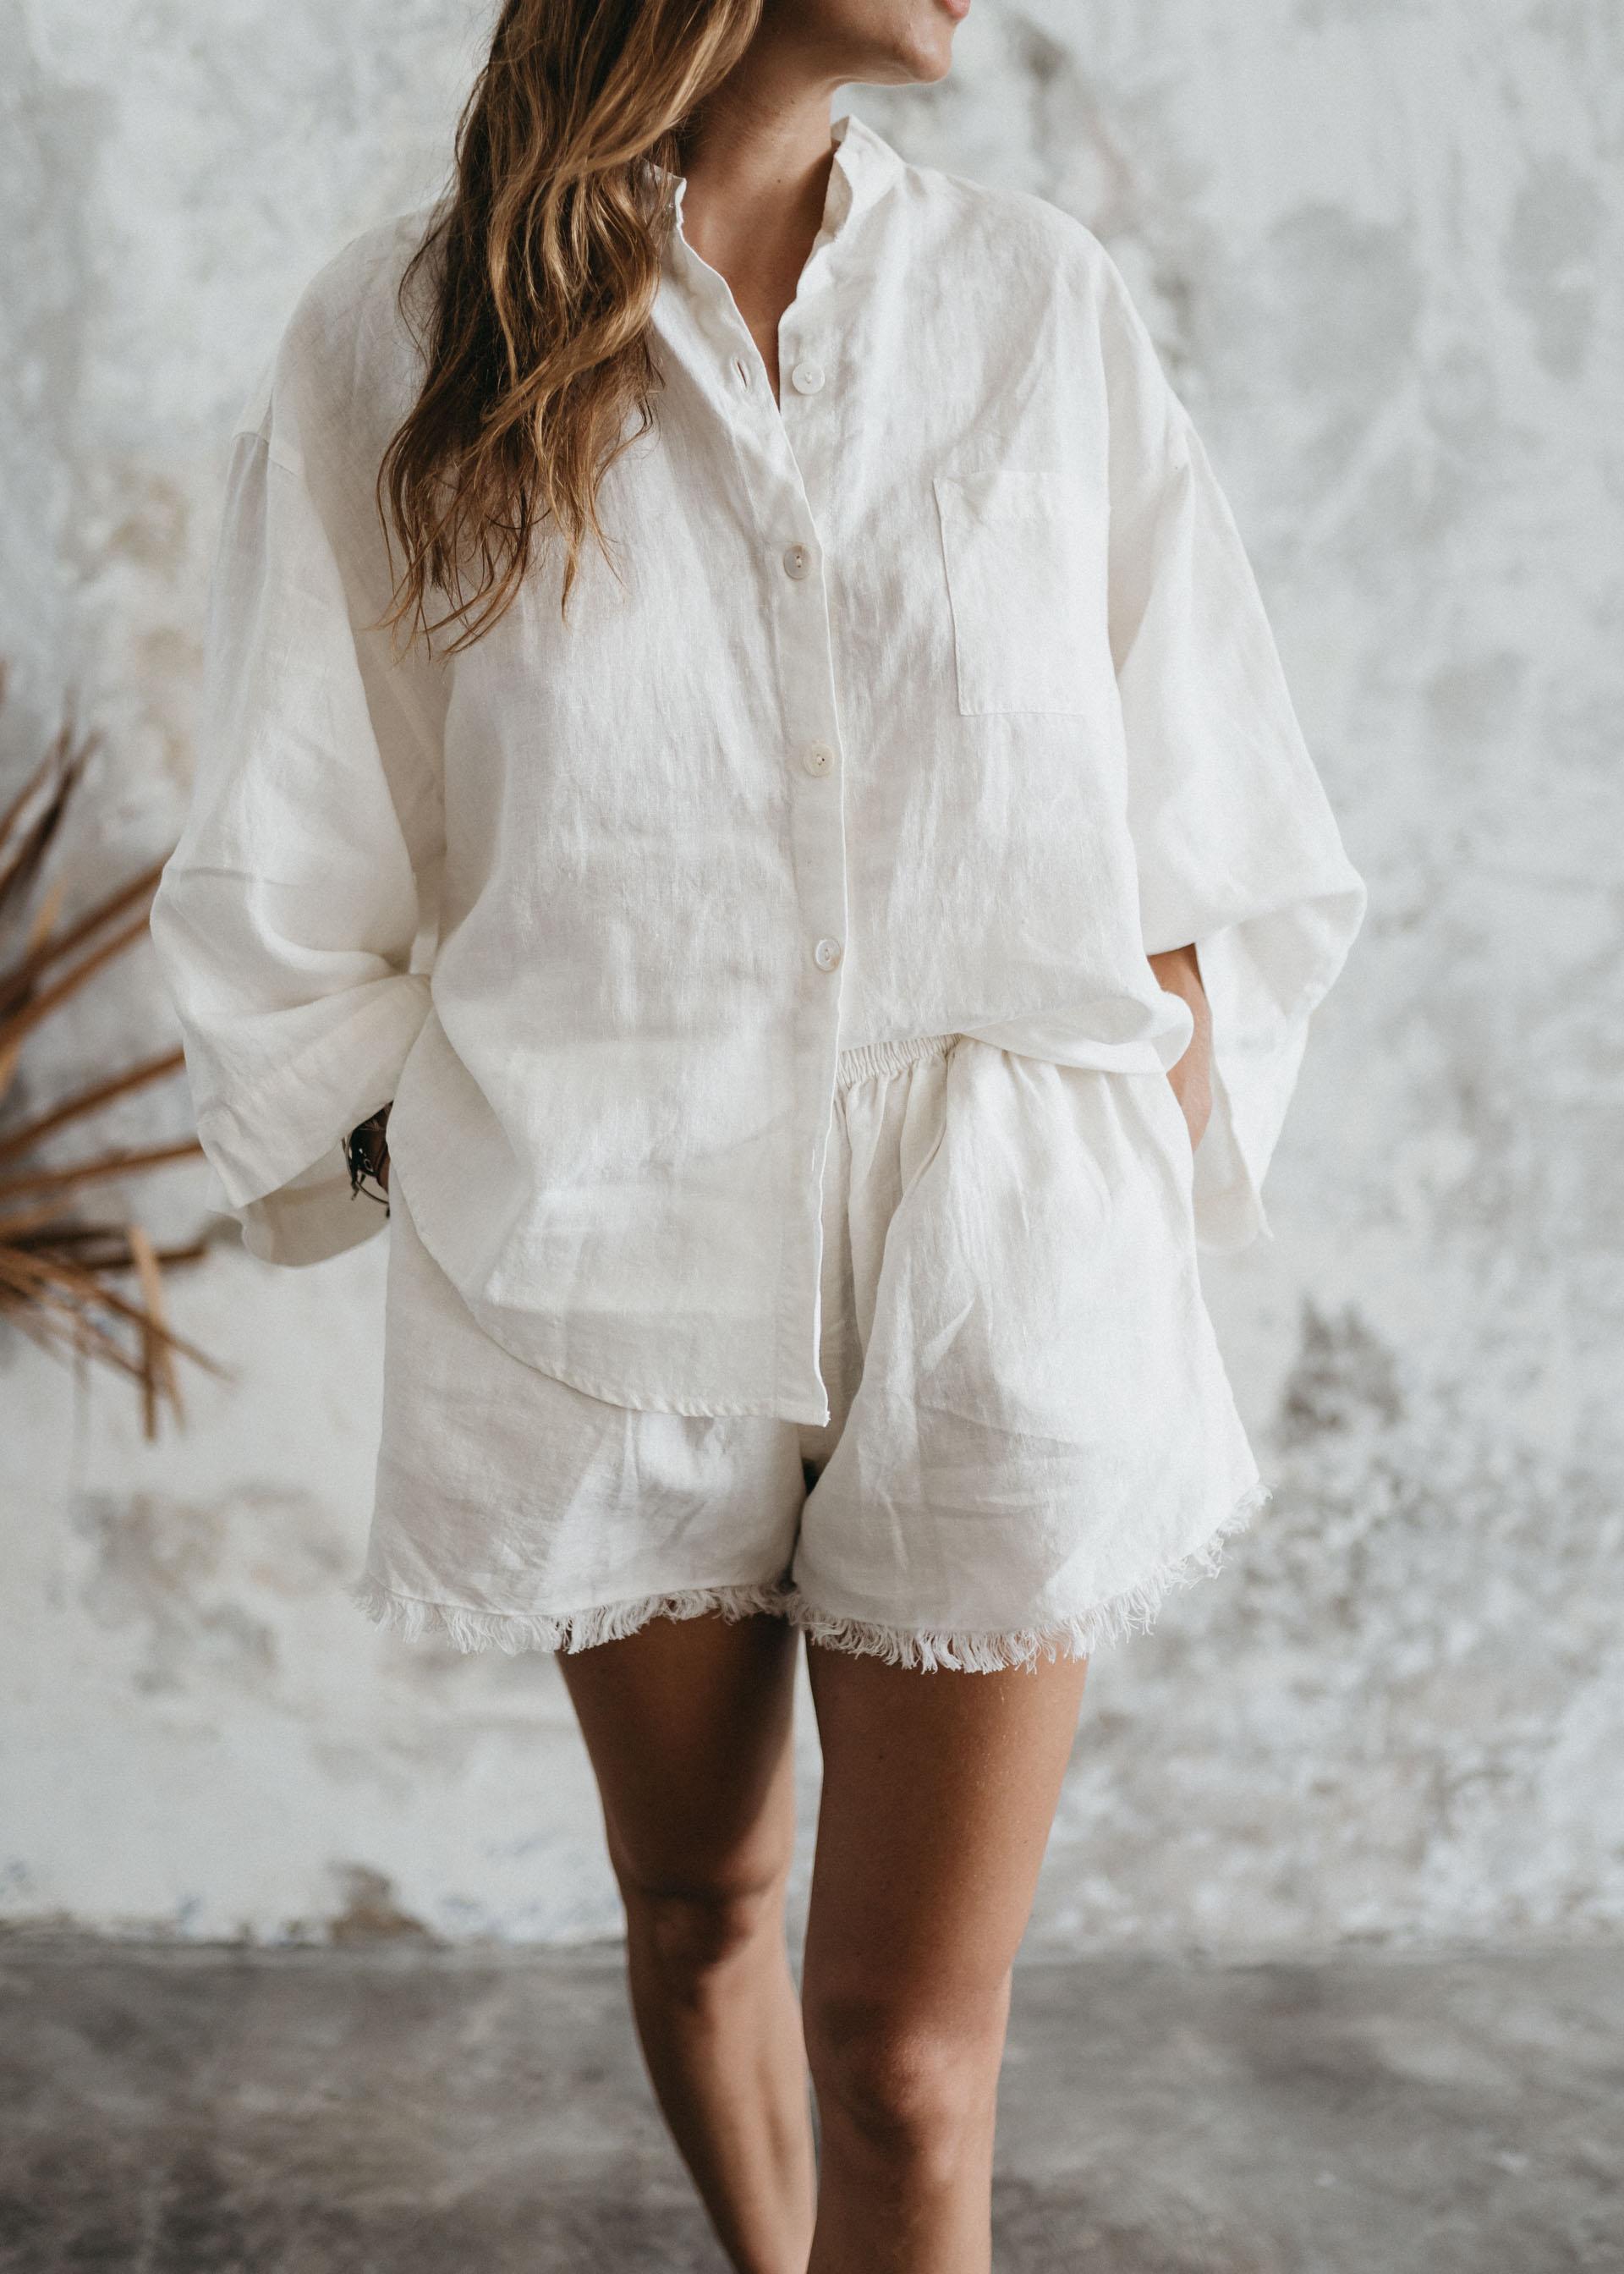 keira-mason-studio-karma-white-linen-set-close-up.jpg